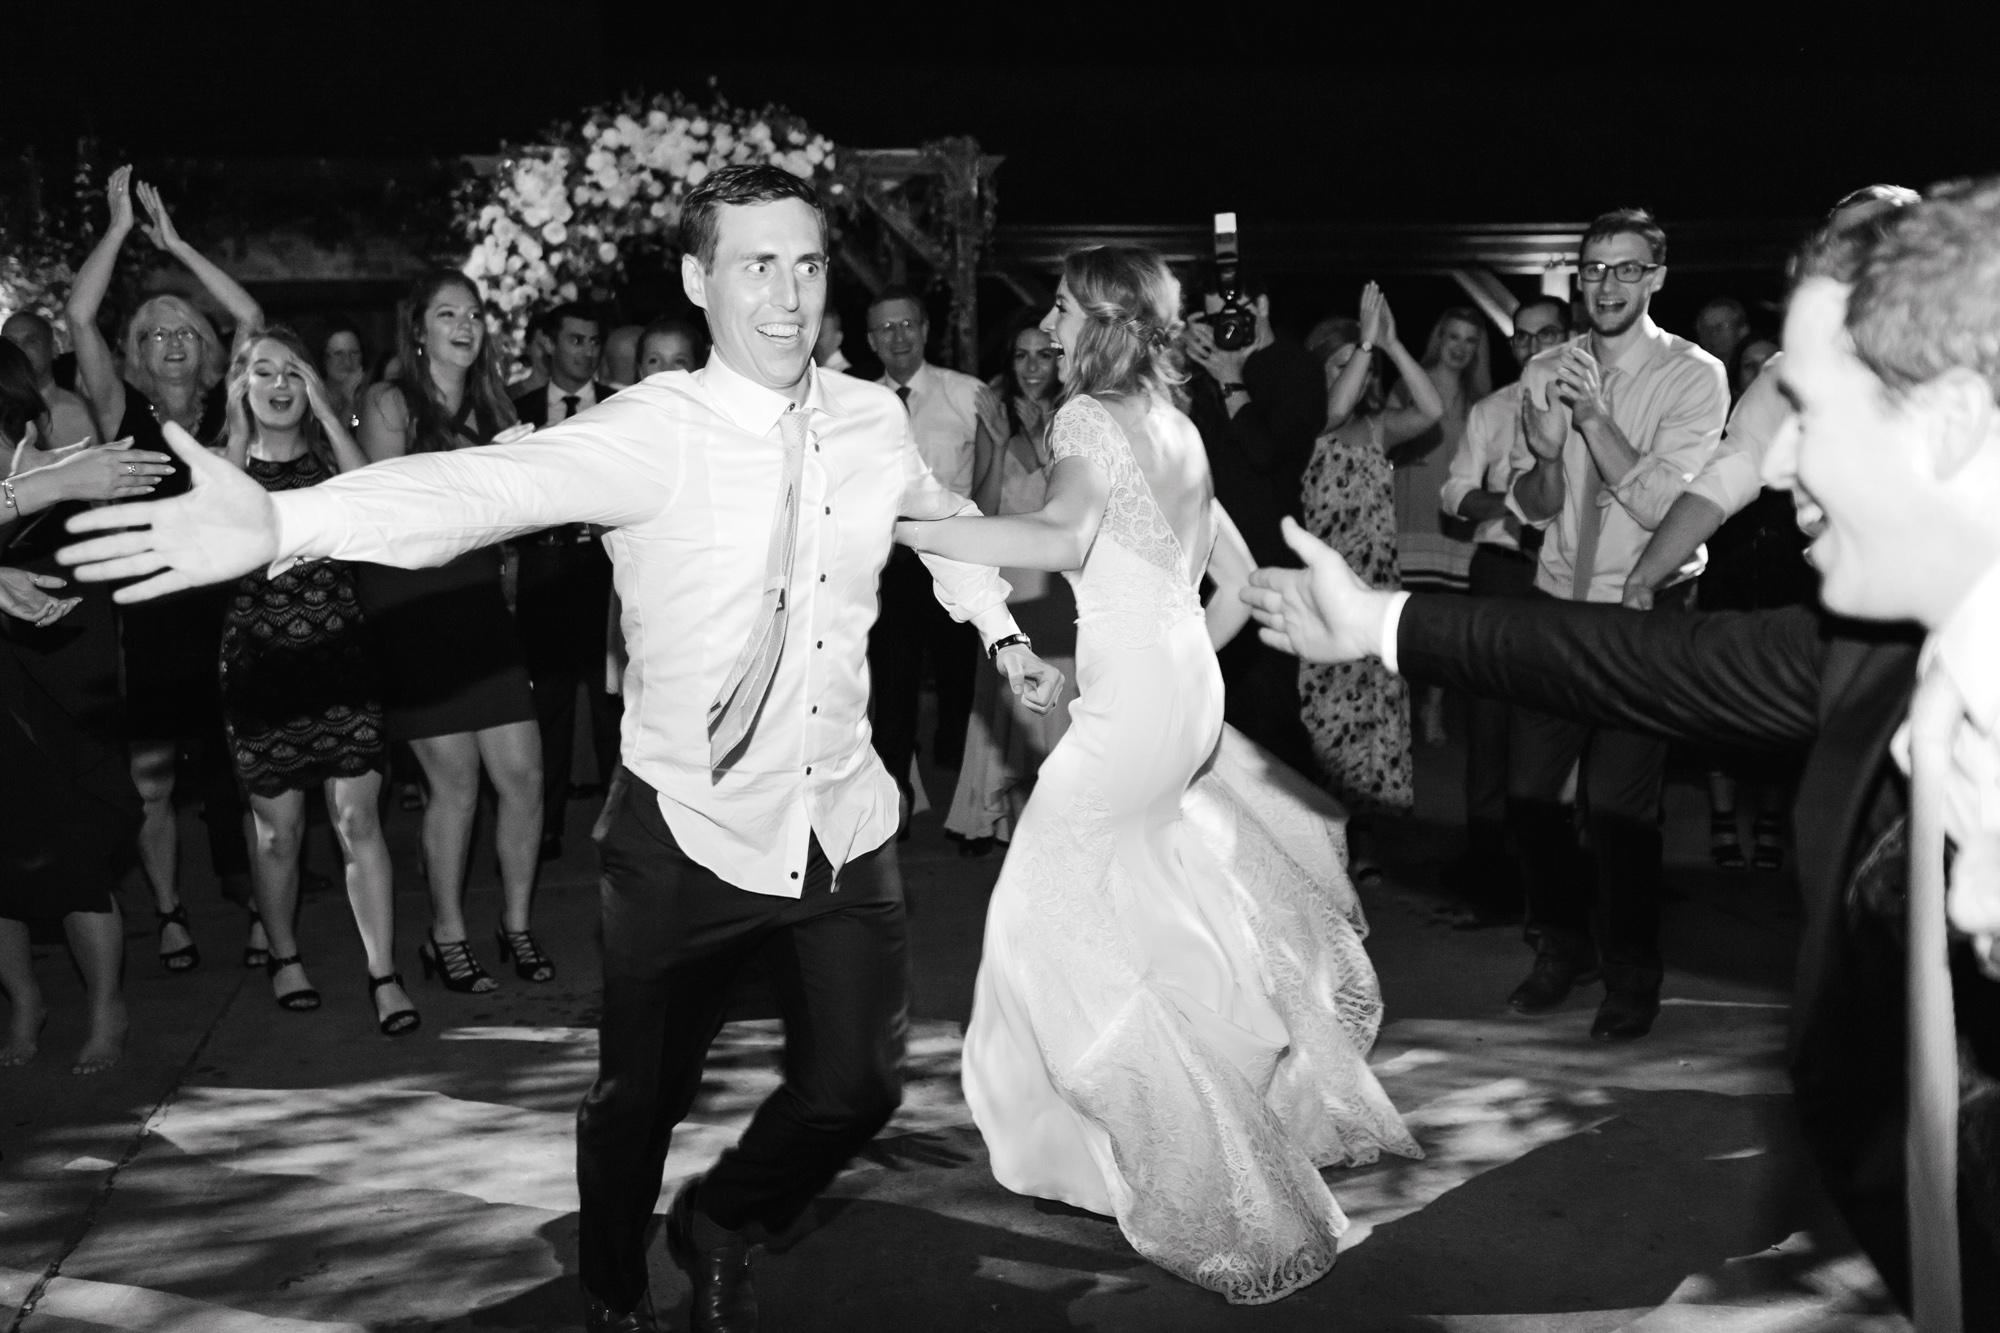 74_Jessica_Ted_Blue_Hill_Stone_Barns_Wedding_Pocantico_NY_Tanya_Salazar_Photography_211.jpg